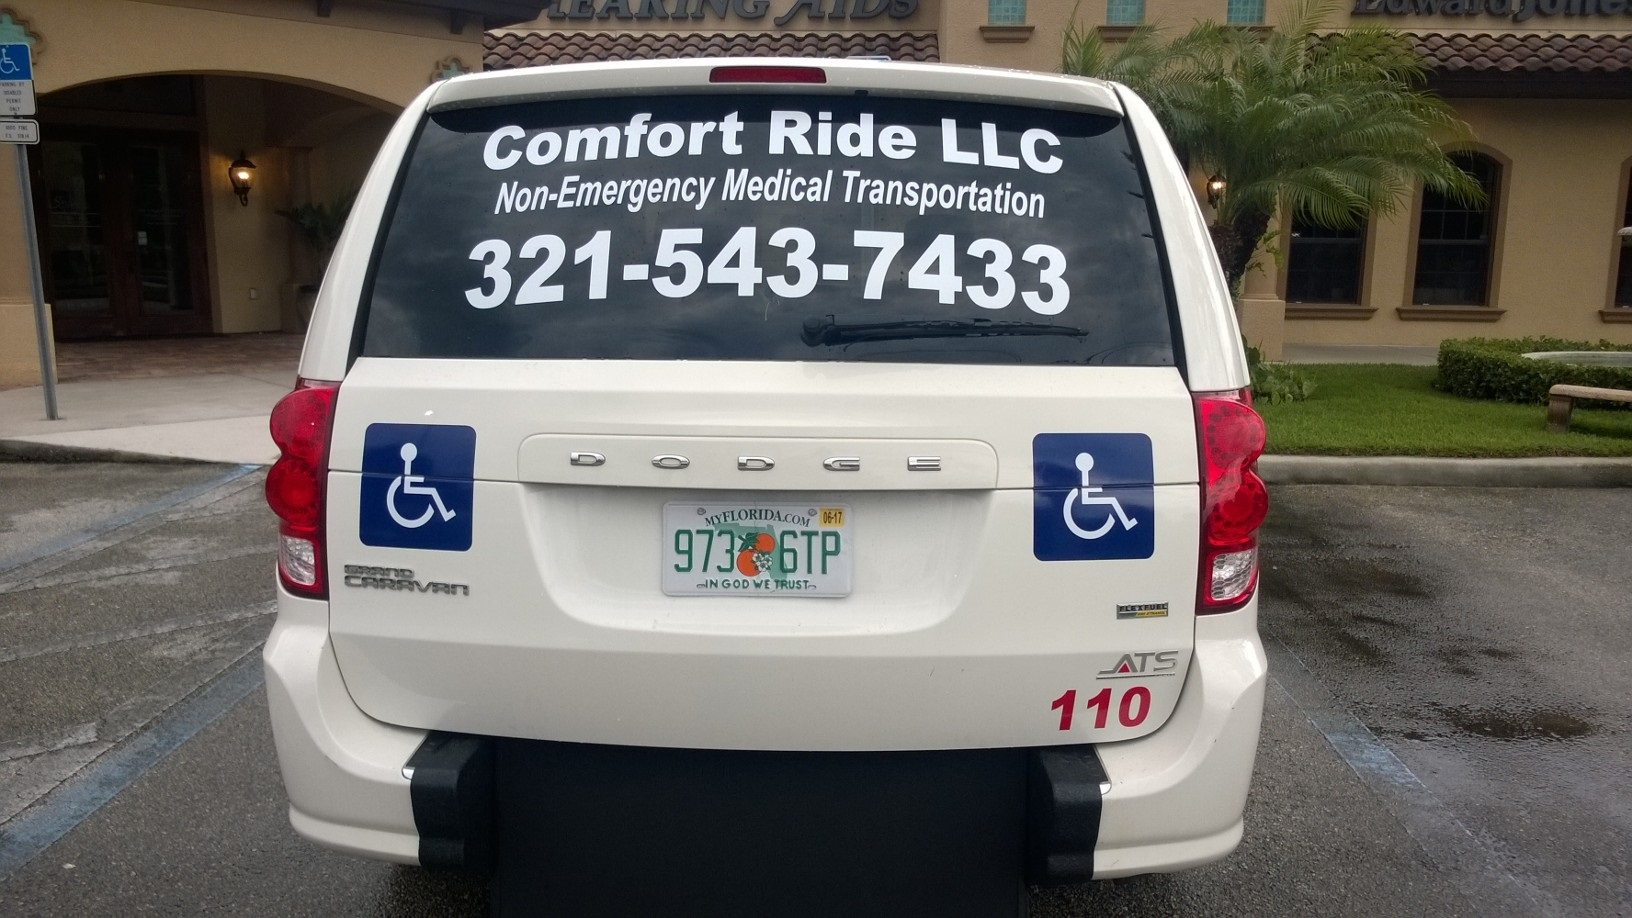 Comfort Ride LLC image 11